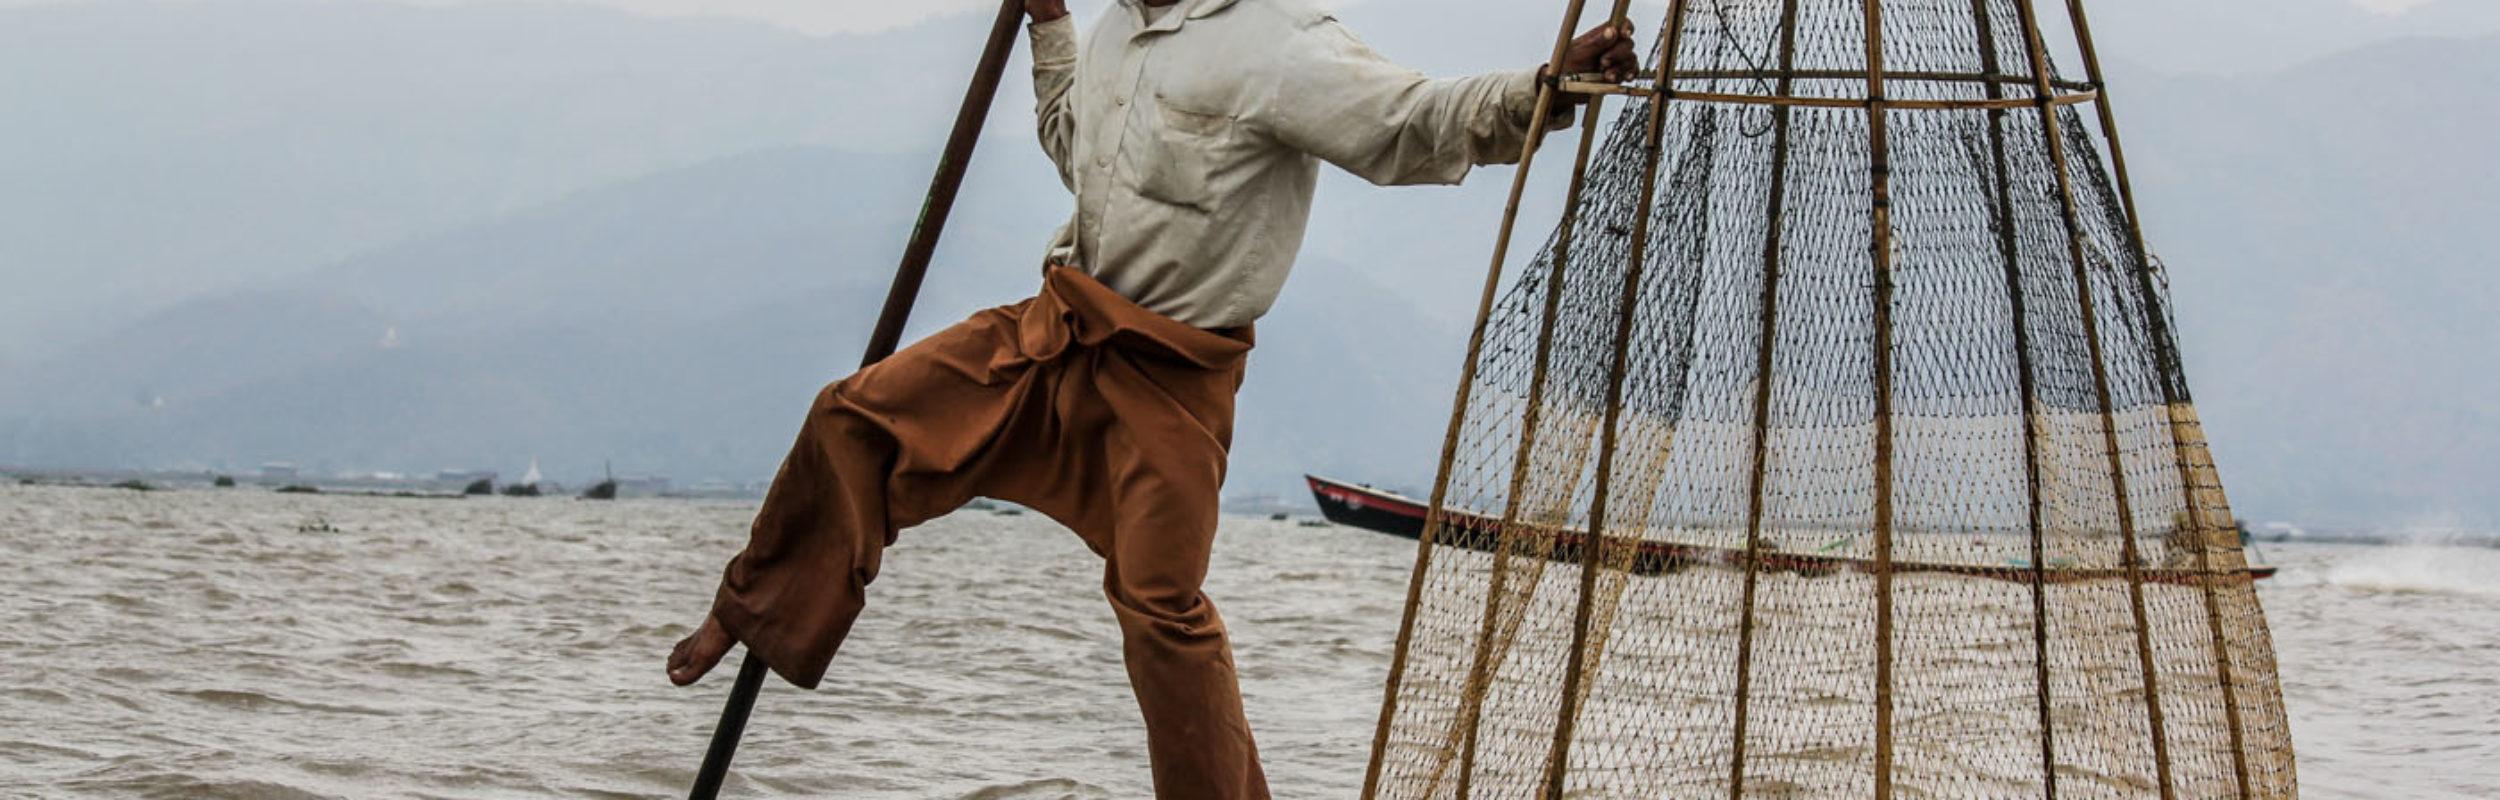 Birmanie : la splendeur du lac Inlé